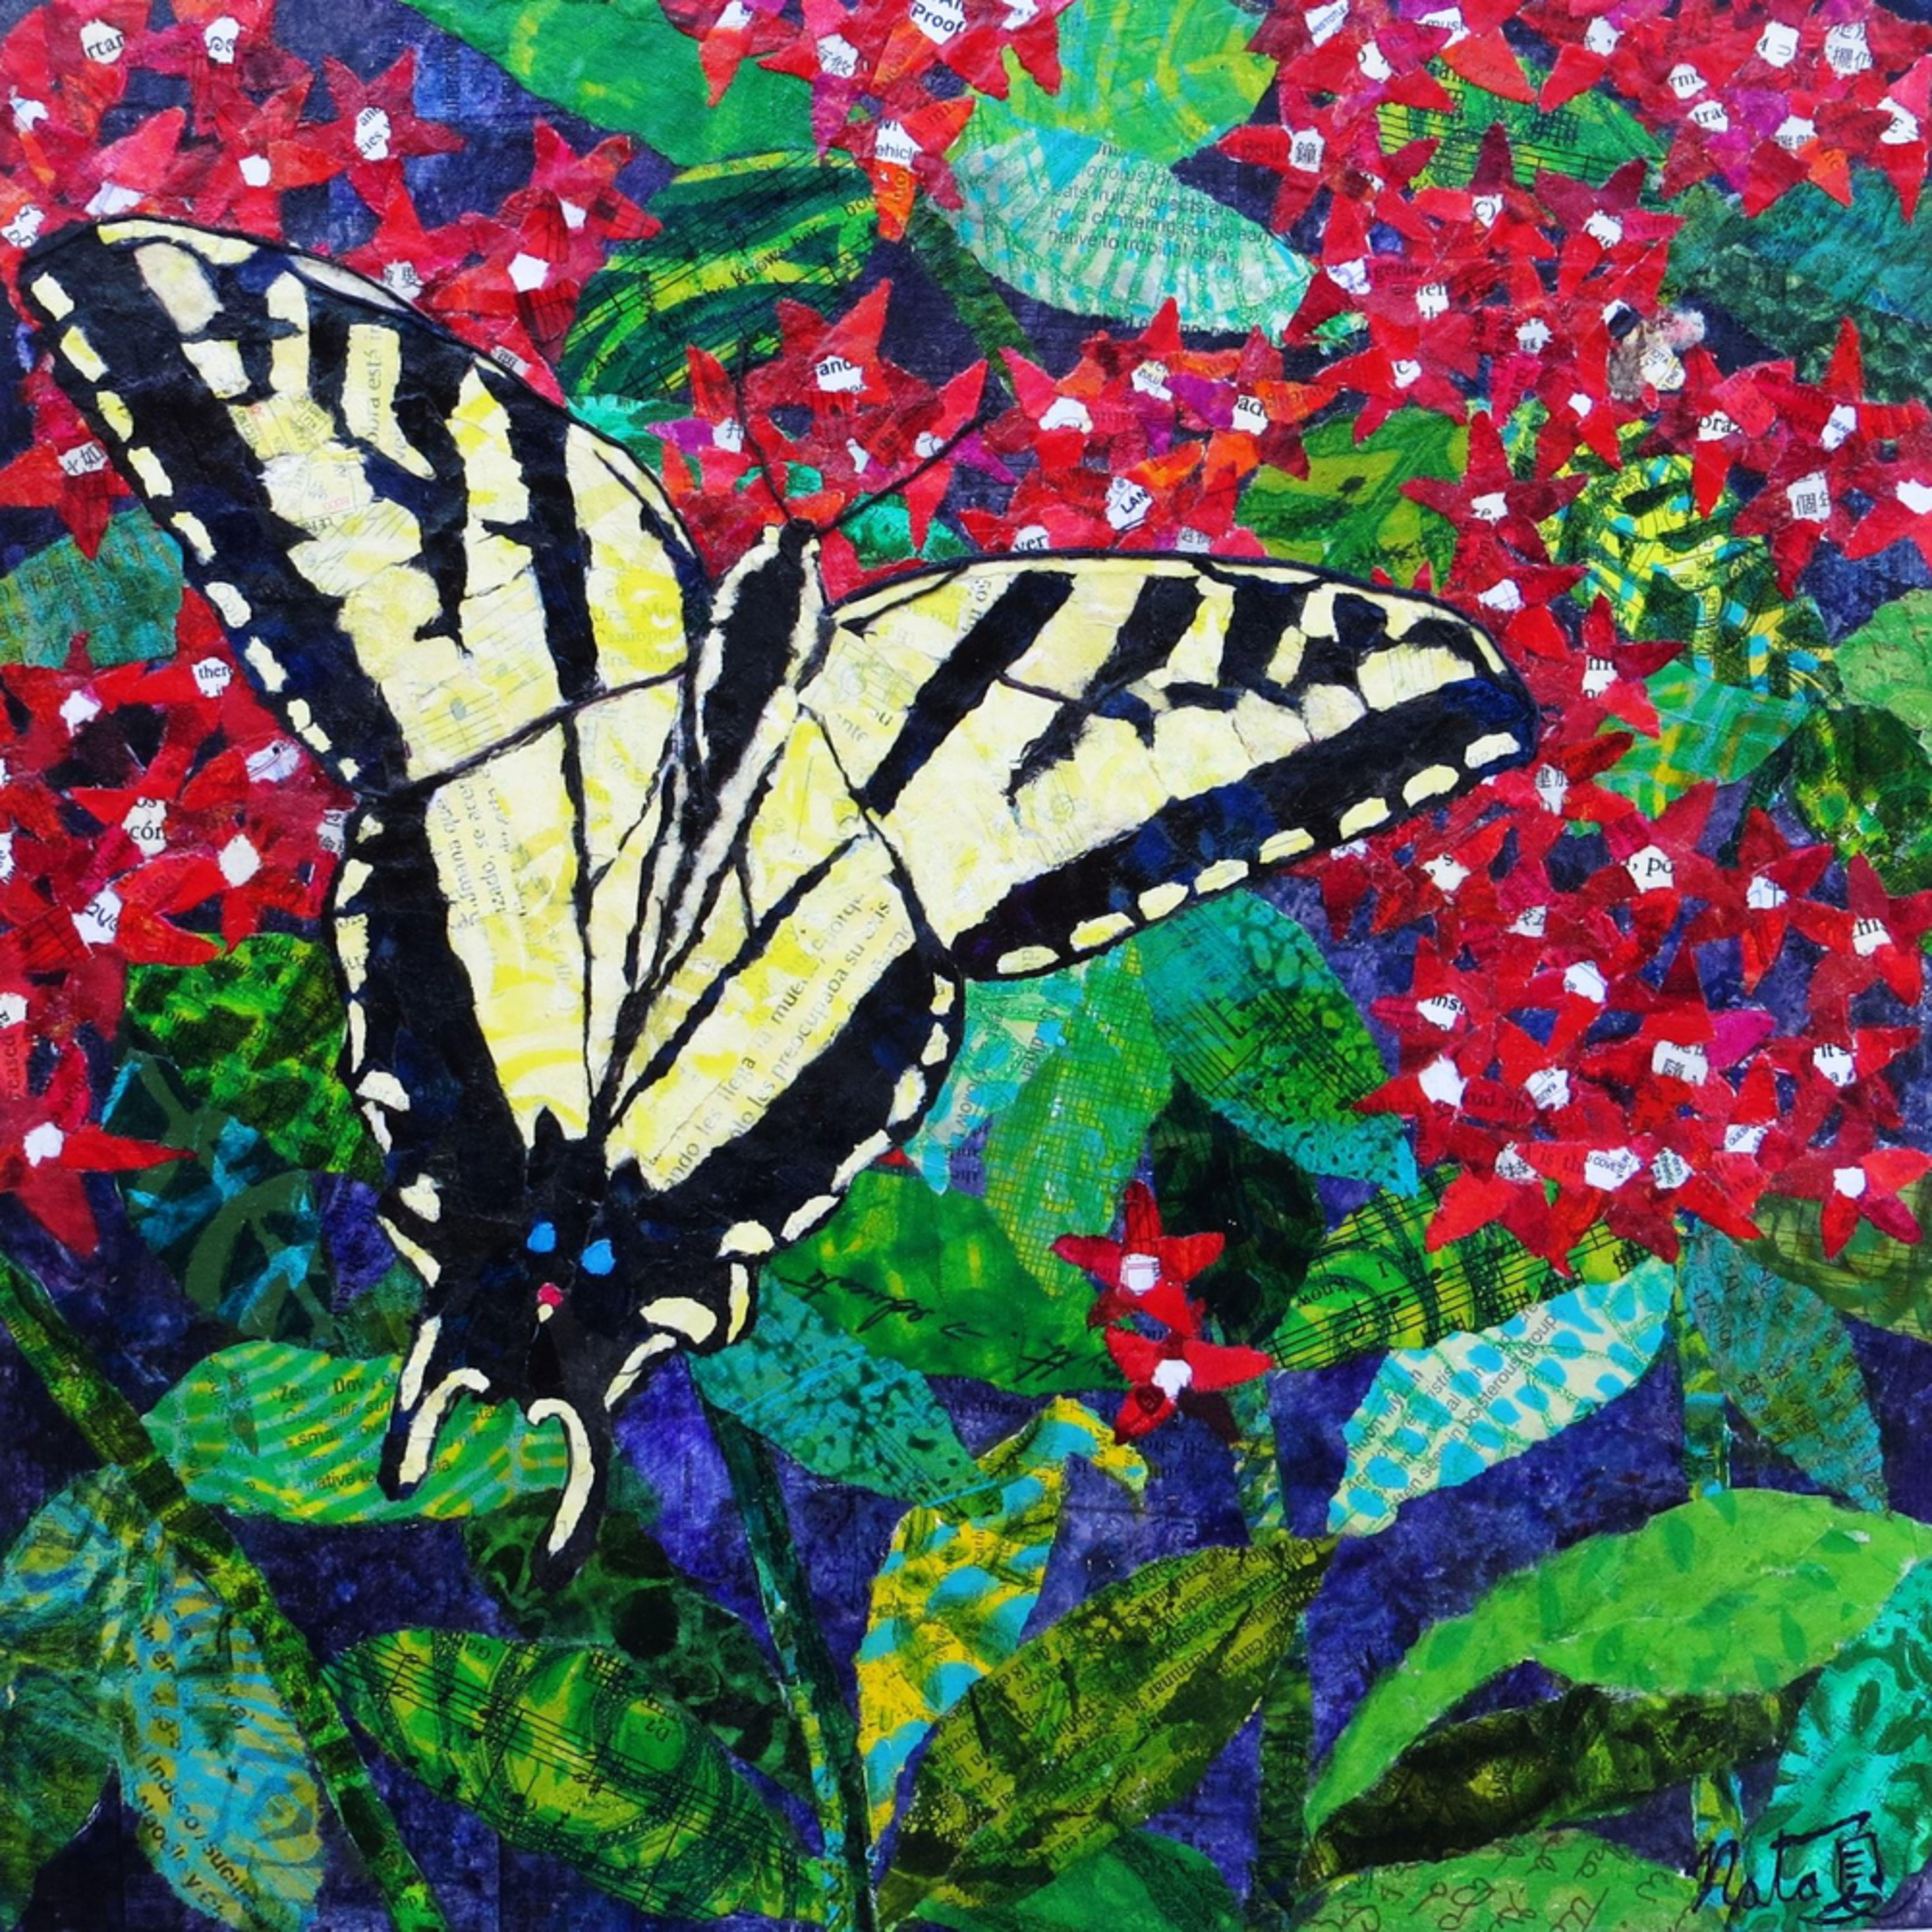 Catchatigerswallowtail 300dpi 40x40 lxod6o